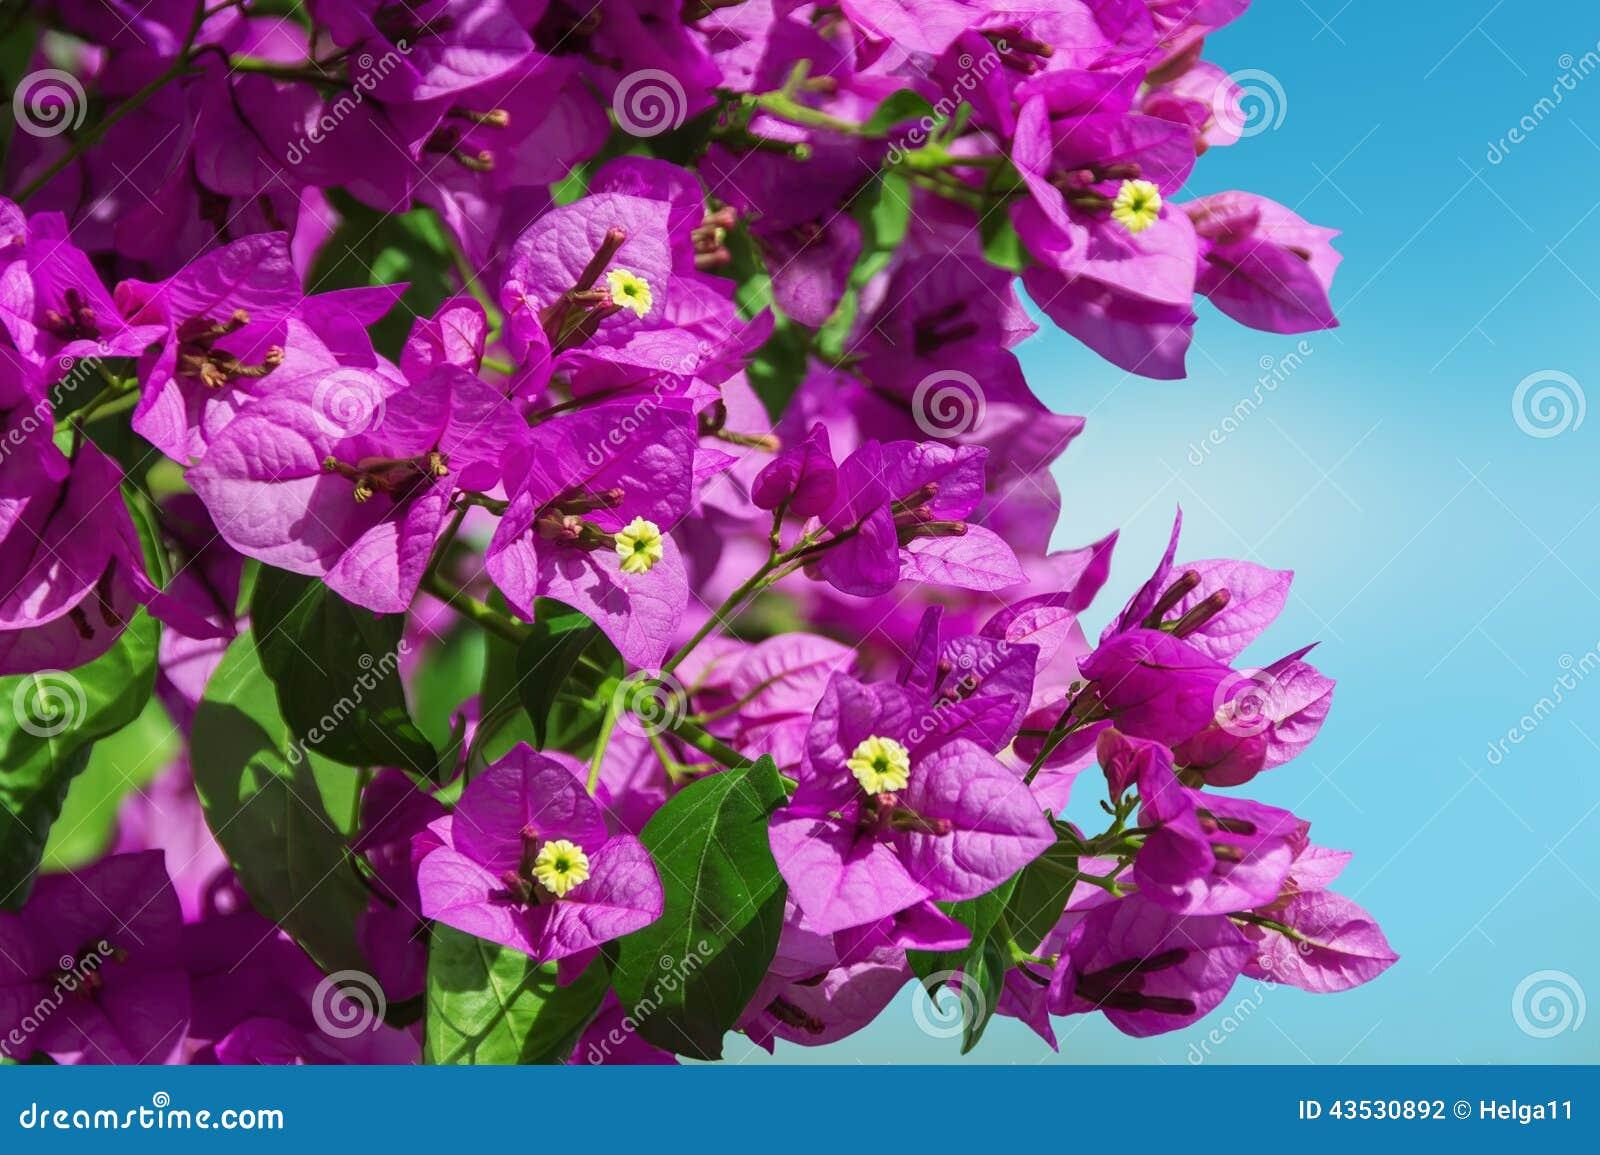 Purple Bougainvillea Stock Photo Image Of Tree Vine 43530892